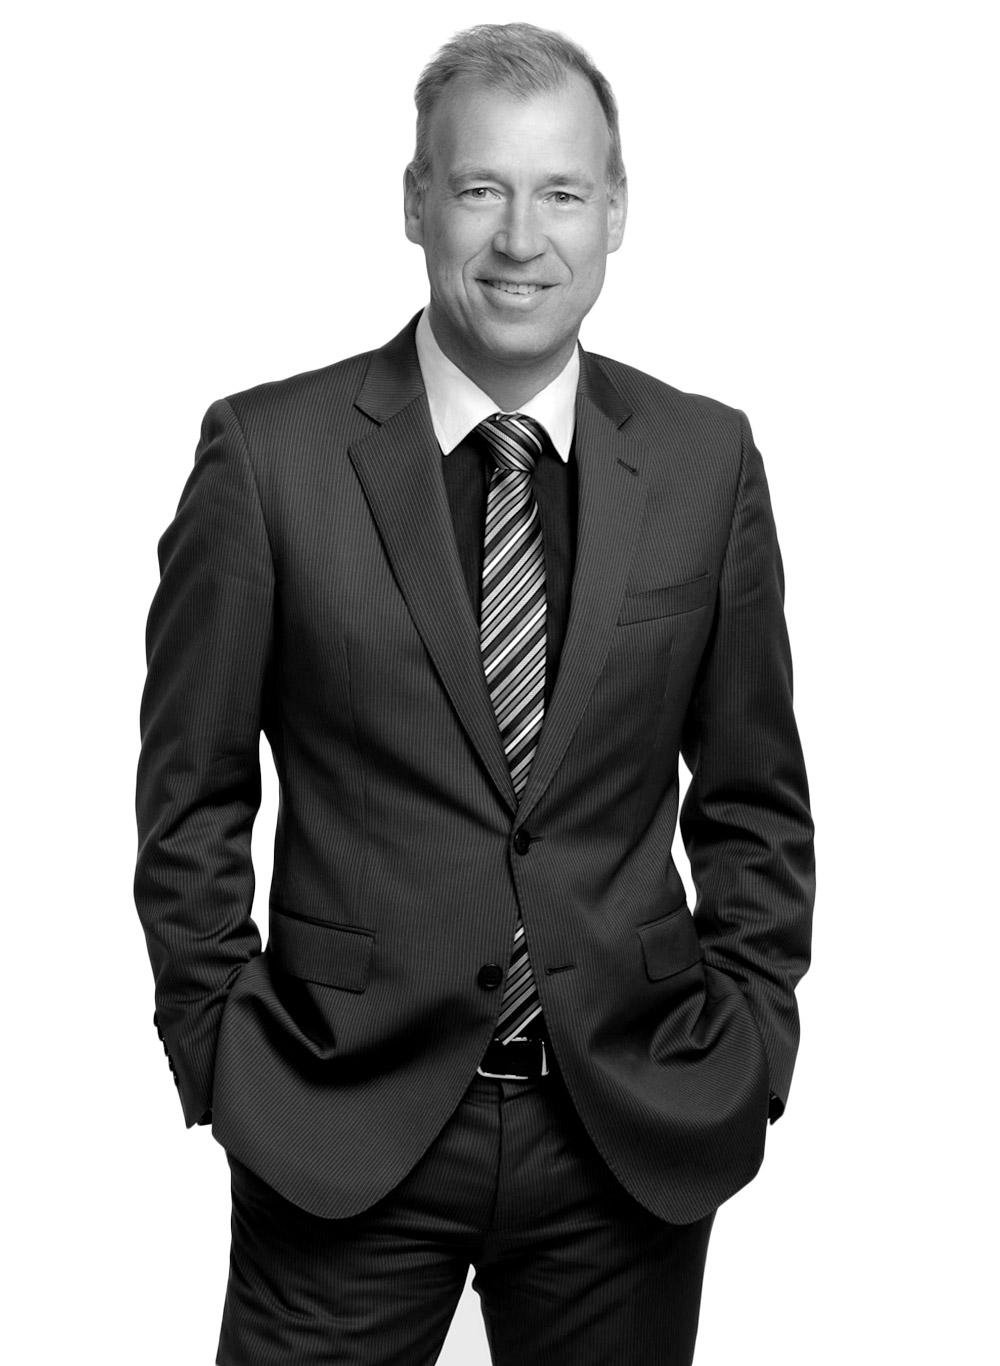 Portnordica Ole-Thomas Joergensen